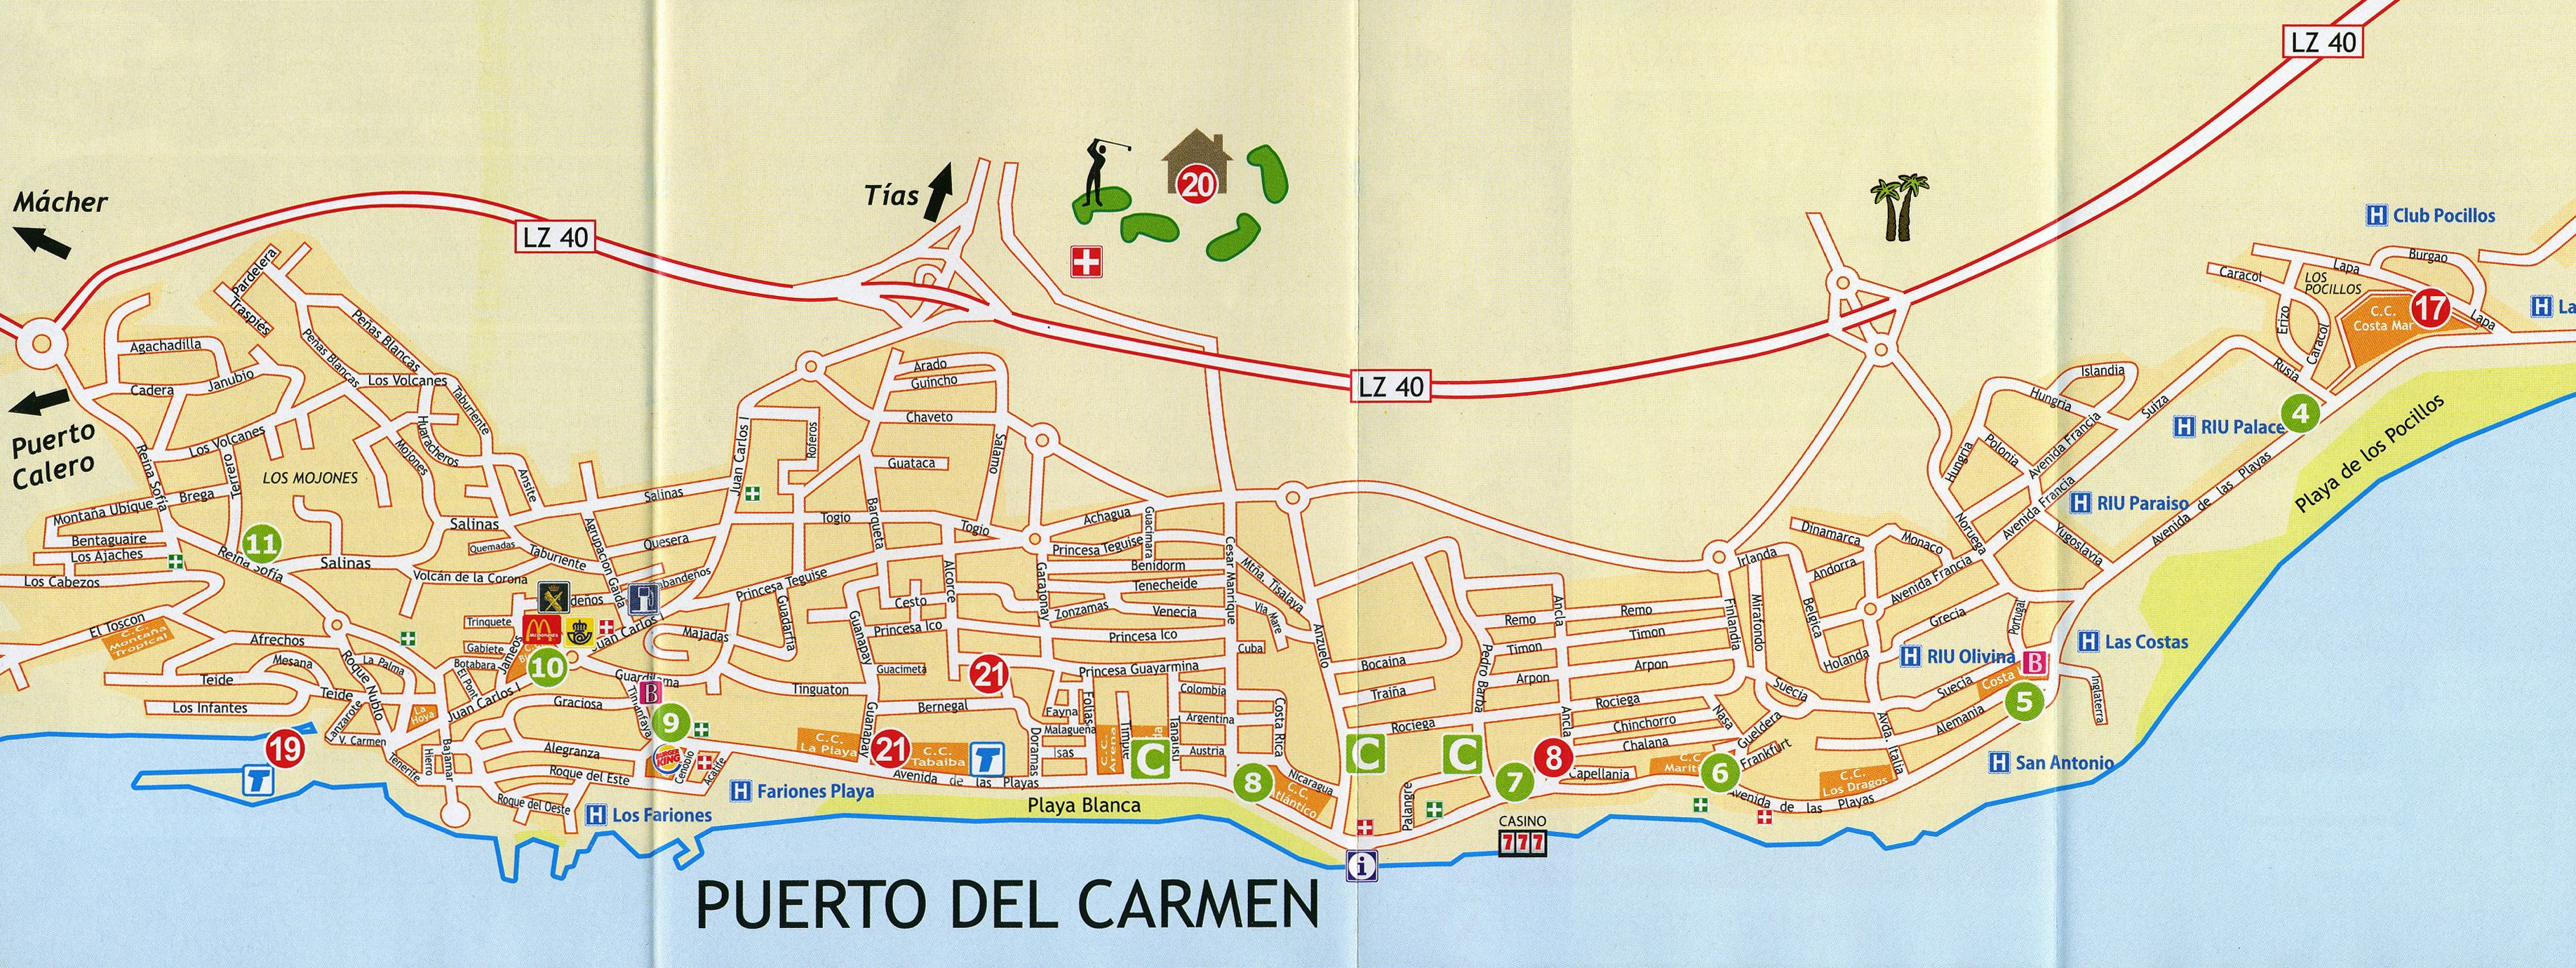 Large Puerto Del Carmen Maps For Free Download And Print | High - Printable Map Of Playa Del Carmen